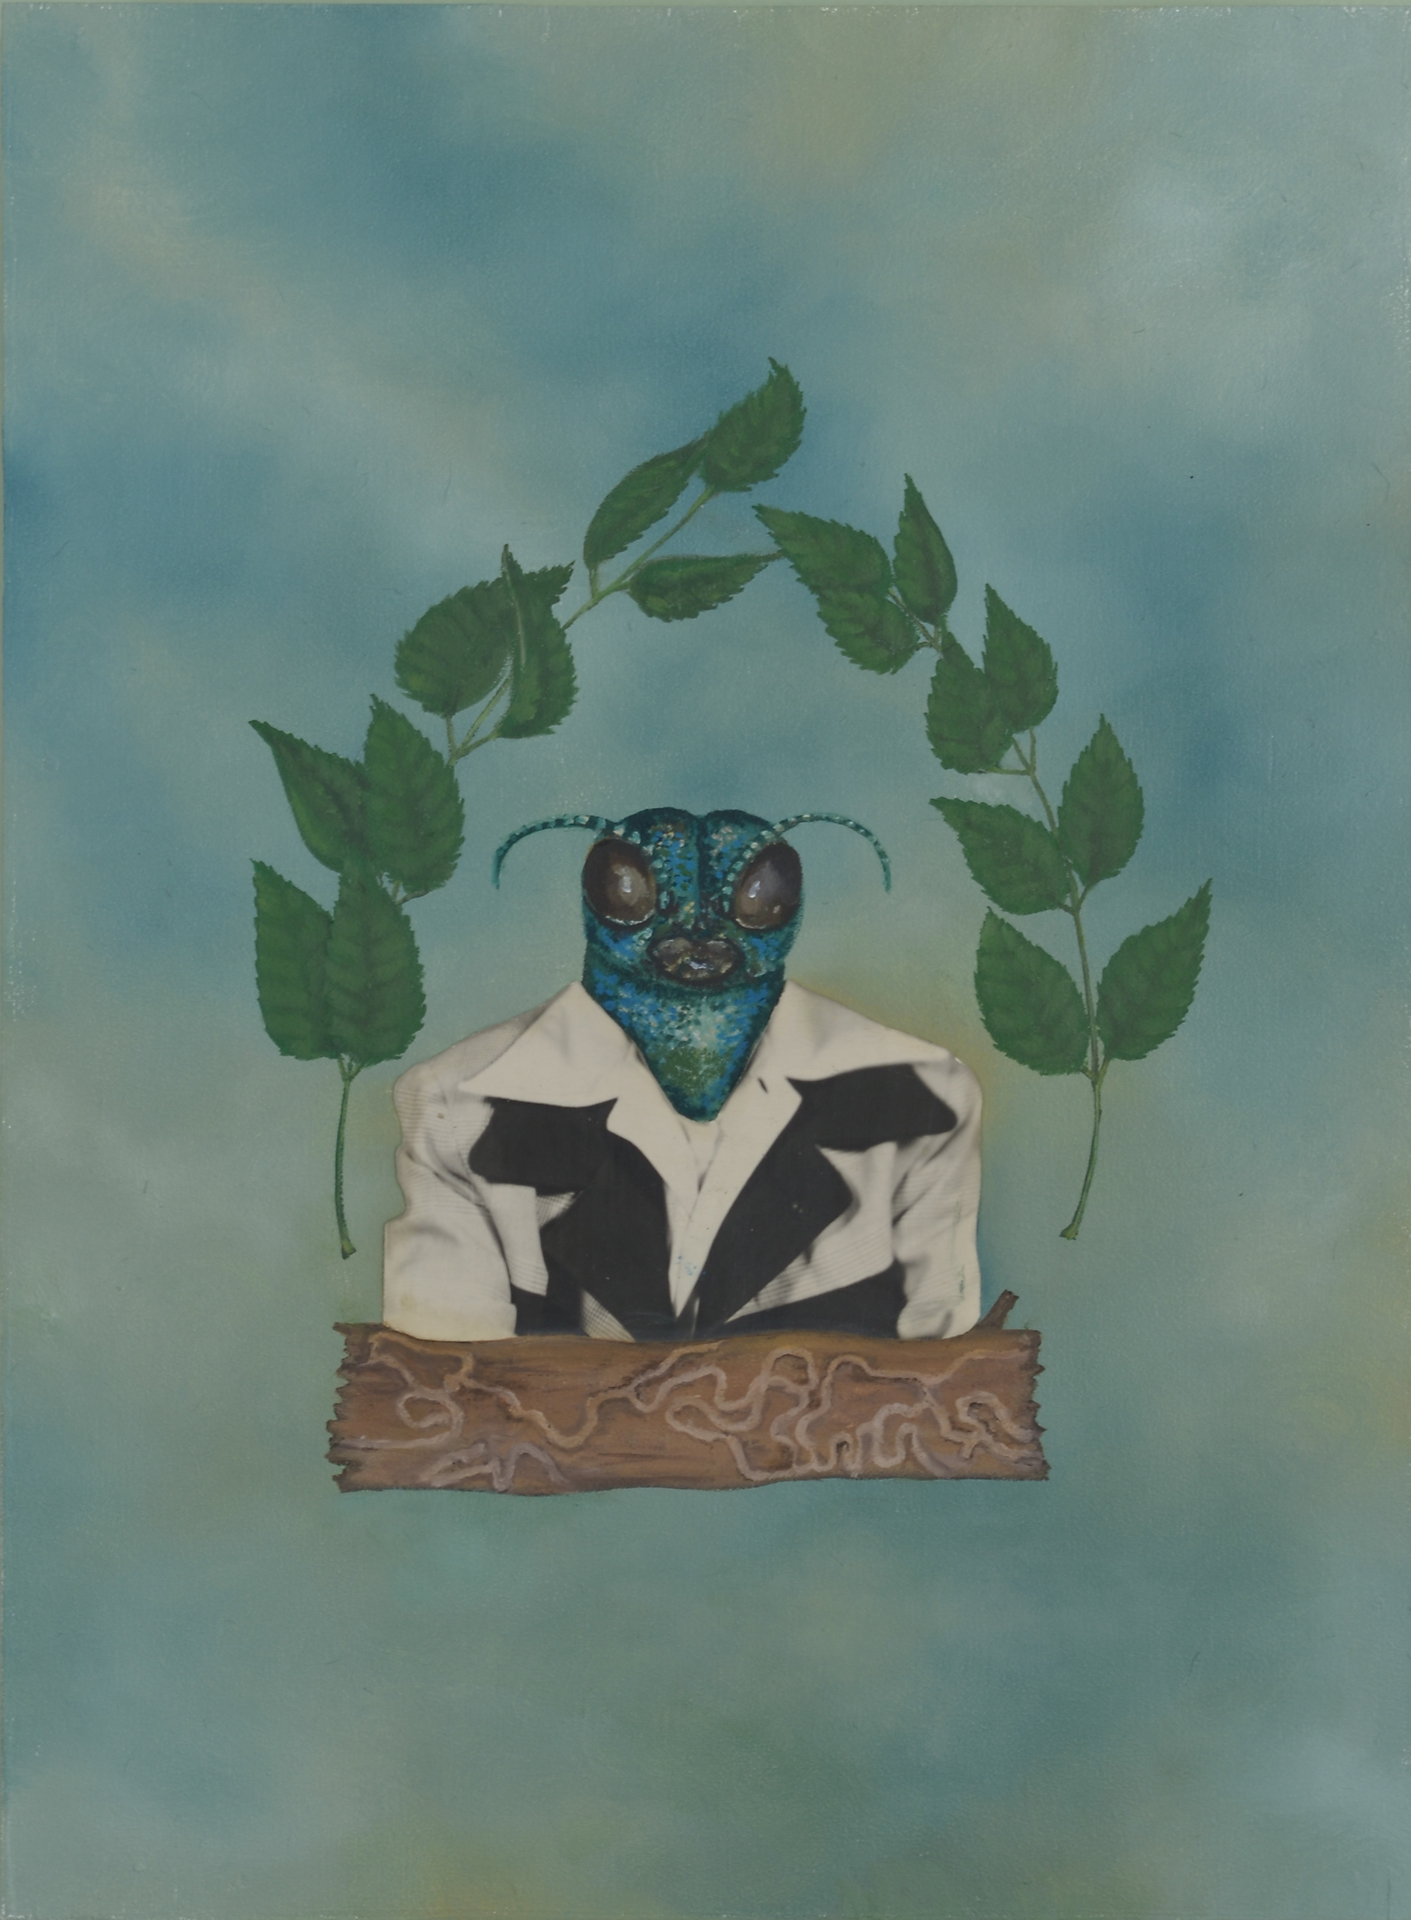 Invasive Species- Emerald Ash Borer